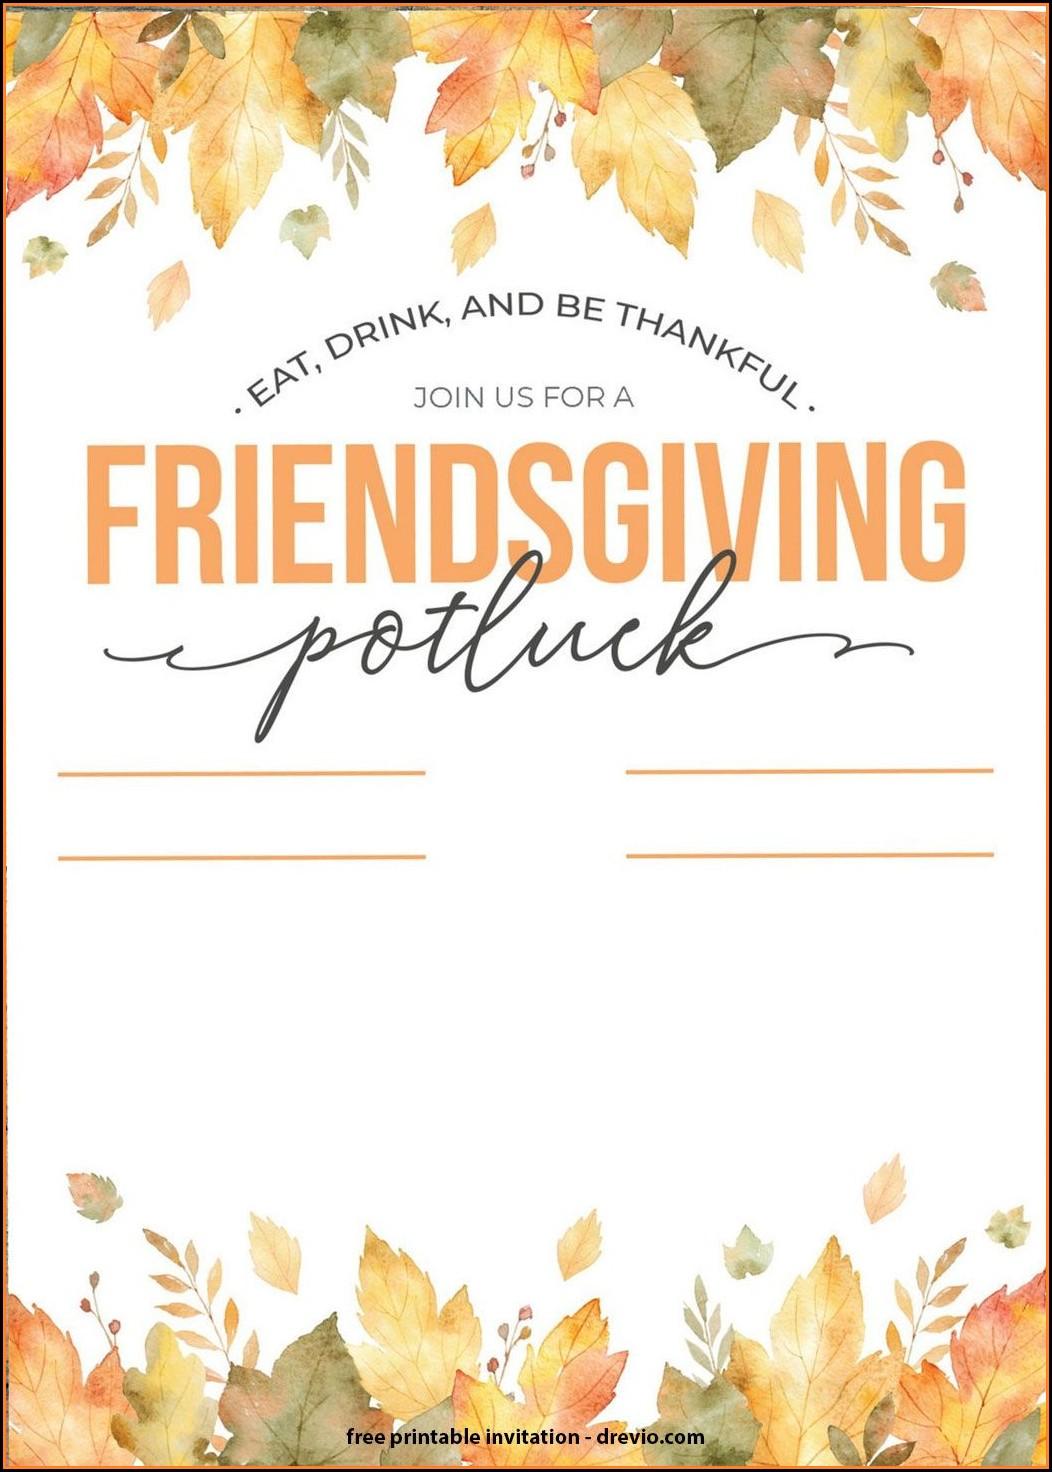 Free Thanksgiving Potluck Invitation Templates